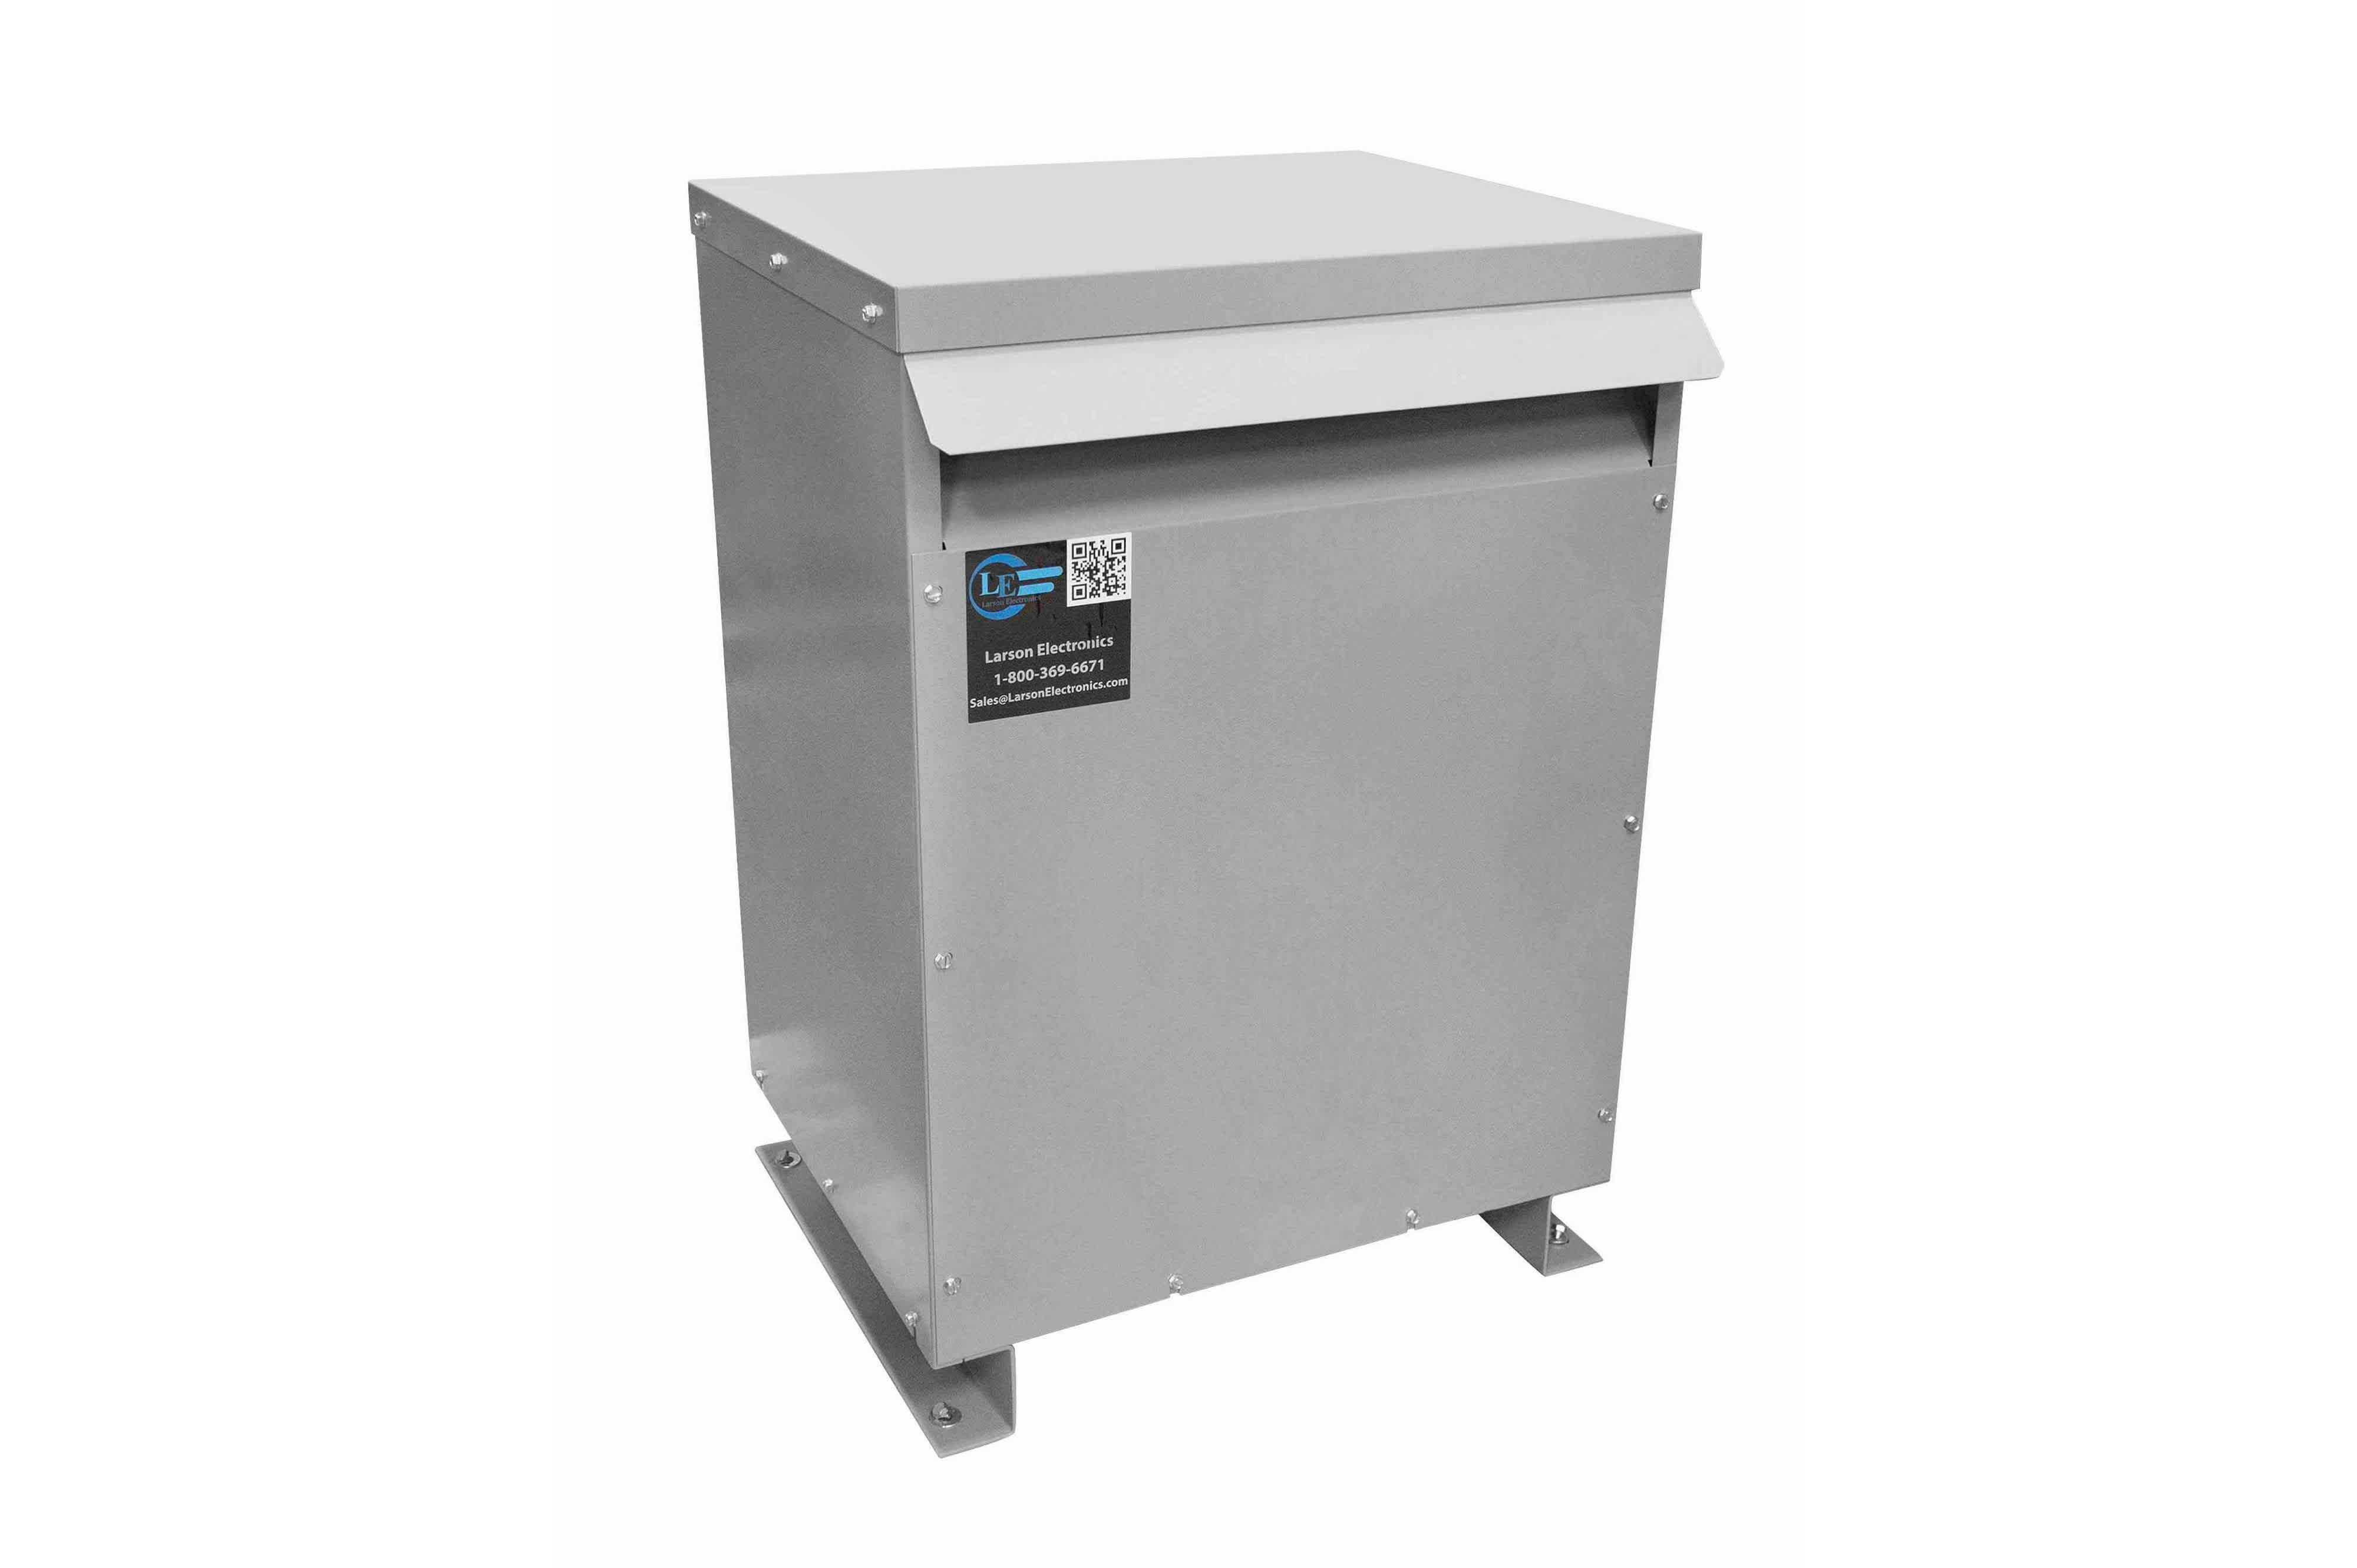 900 kVA 3PH Isolation Transformer, 480V Wye Primary, 208Y/120 Wye-N Secondary, N3R, Ventilated, 60 Hz